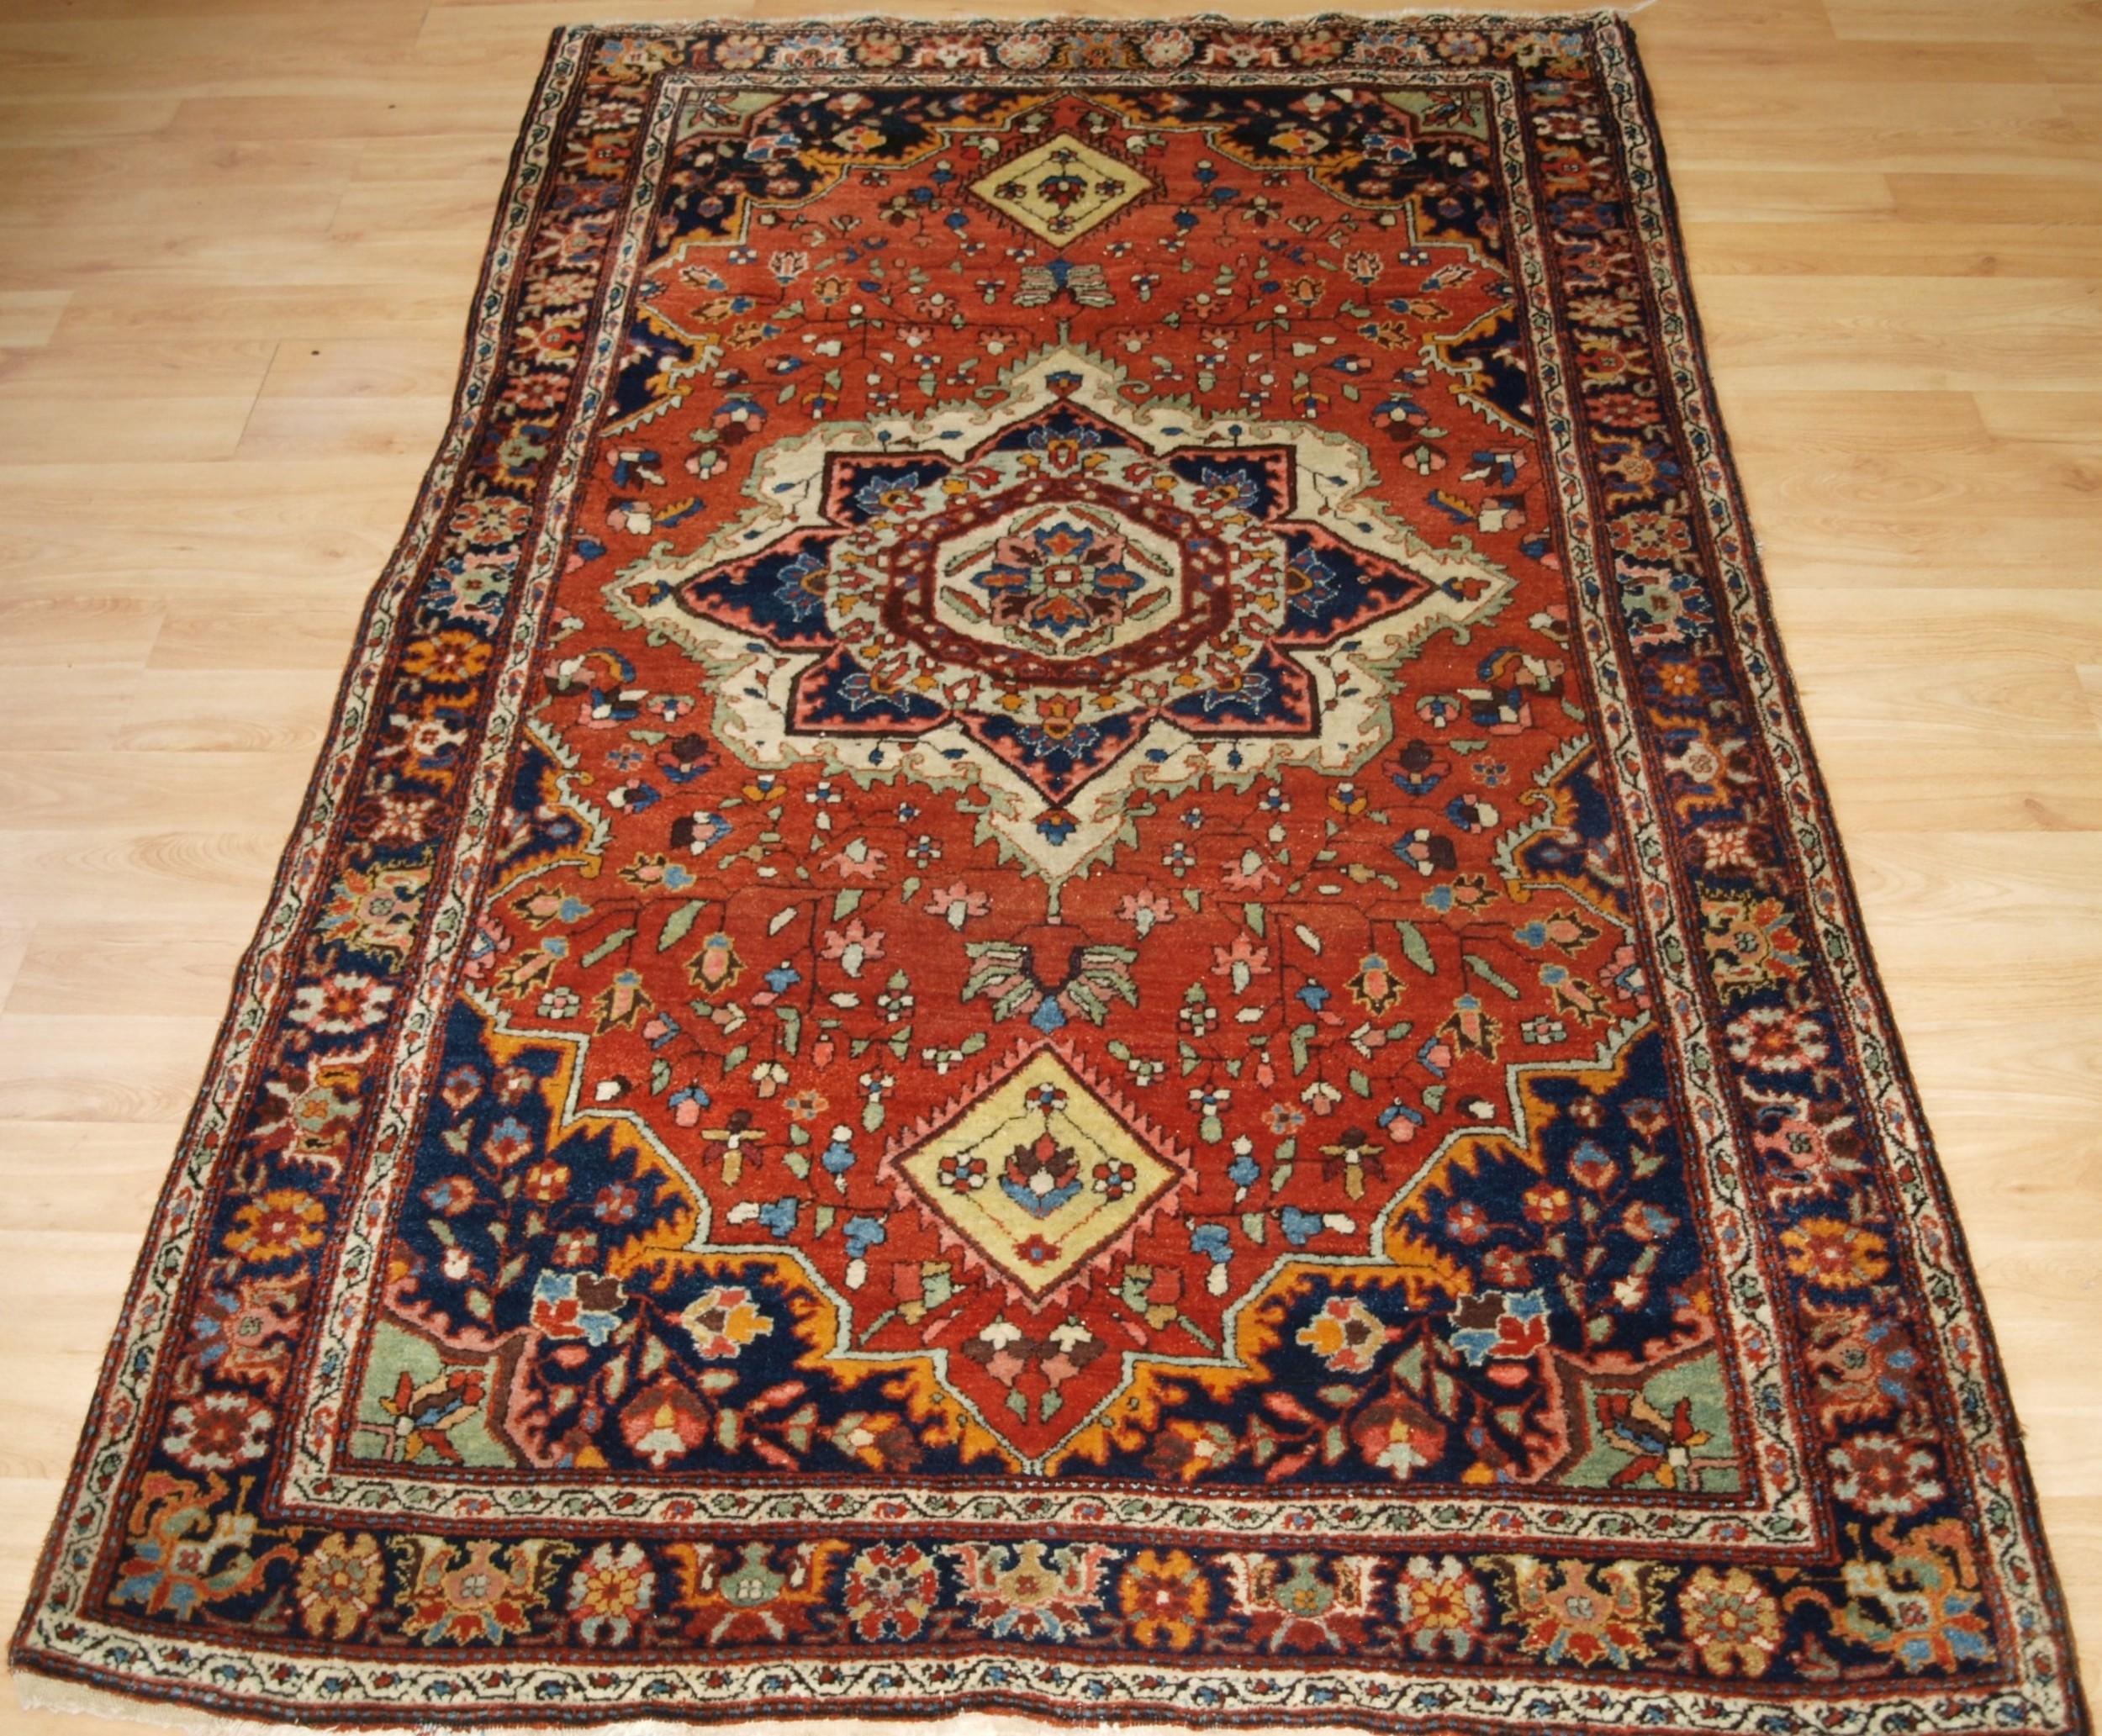 old sarouk rug with traditional design circa 1920